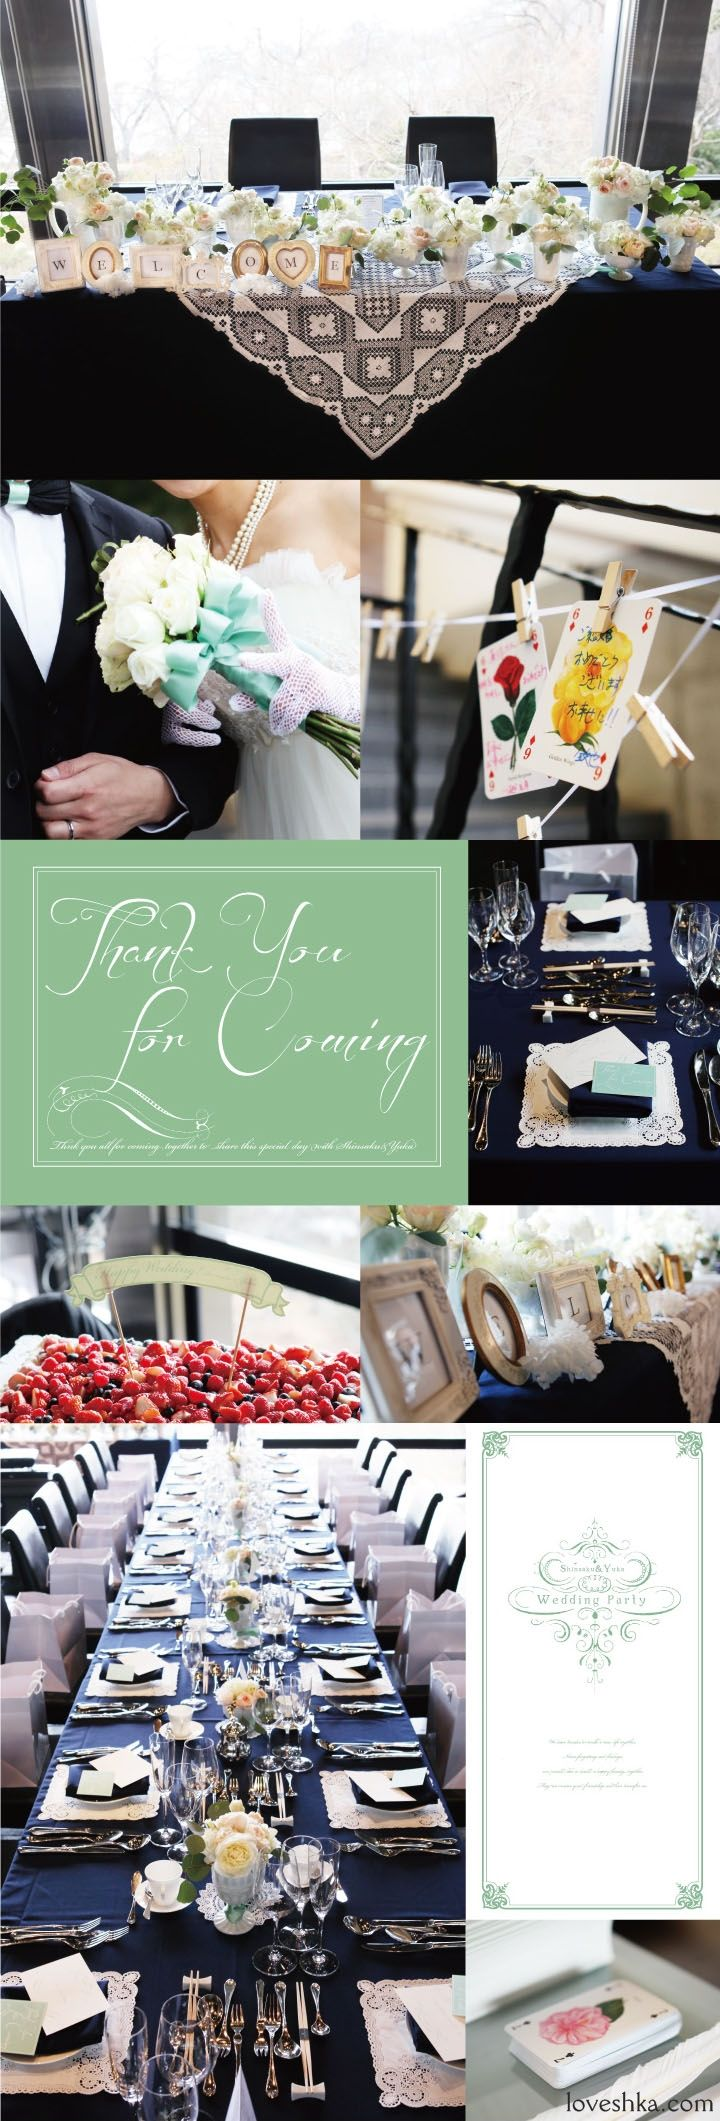 real wedding / 実際のプロデュース / 大人かわいい / ネイビー / レストラン / ウェディング / 結婚式 / wedding / オリジナルウェディング / プティラブーシュカ / トキメクウェディング